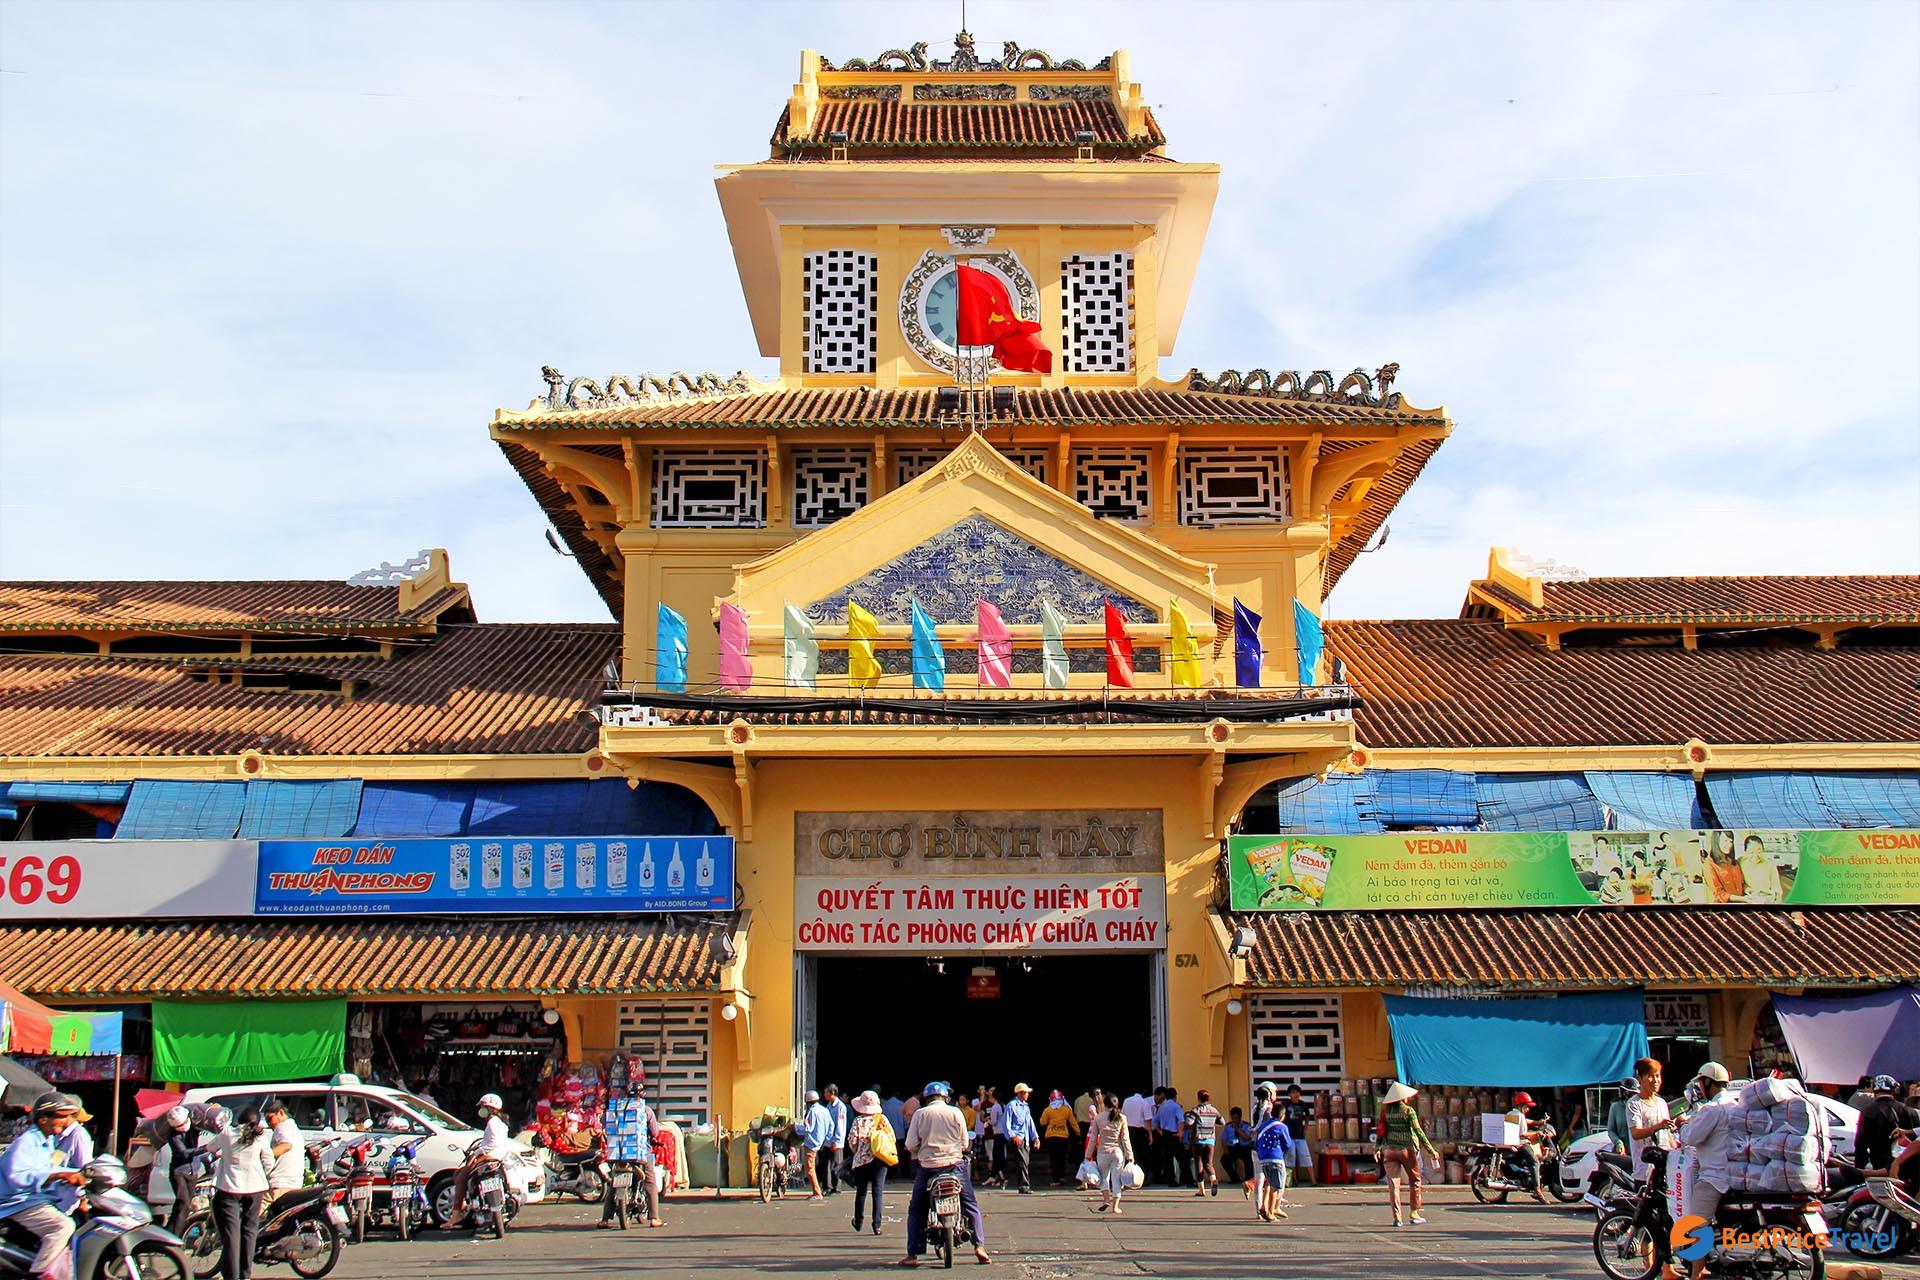 Binh Tay market has fresh foods at reasonable prices